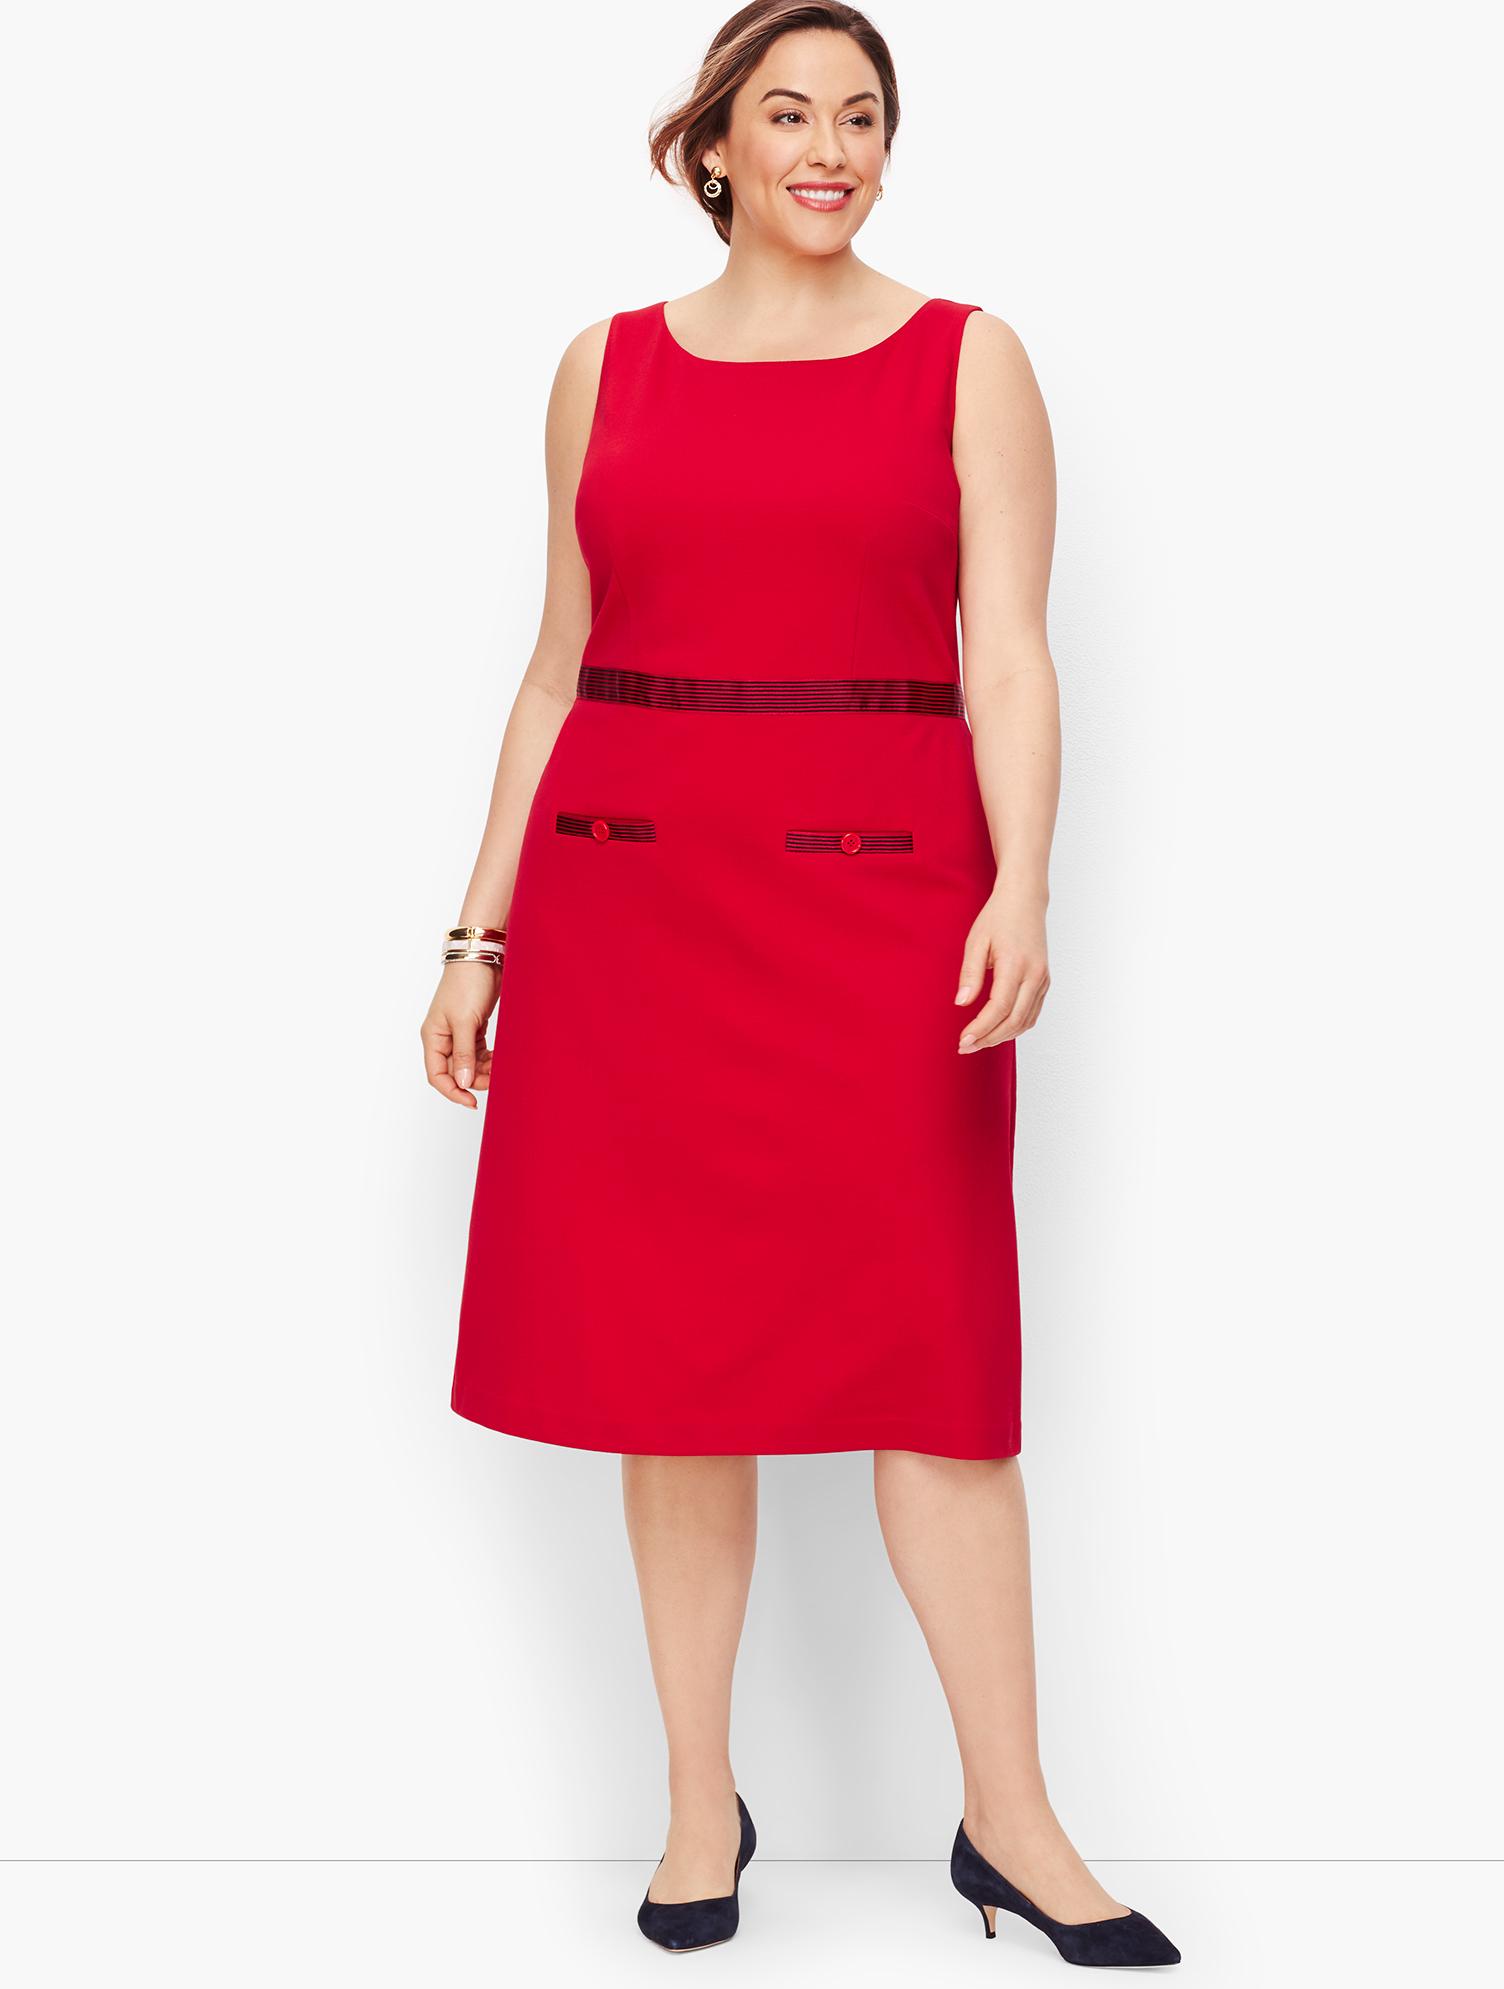 60s 70s Plus Size Dresses, Clothing, Costumes Ponte Grosgrain-trim Sheath Dress - Stripe - RED-POP - 22 - Talbots $119.99 AT vintagedancer.com